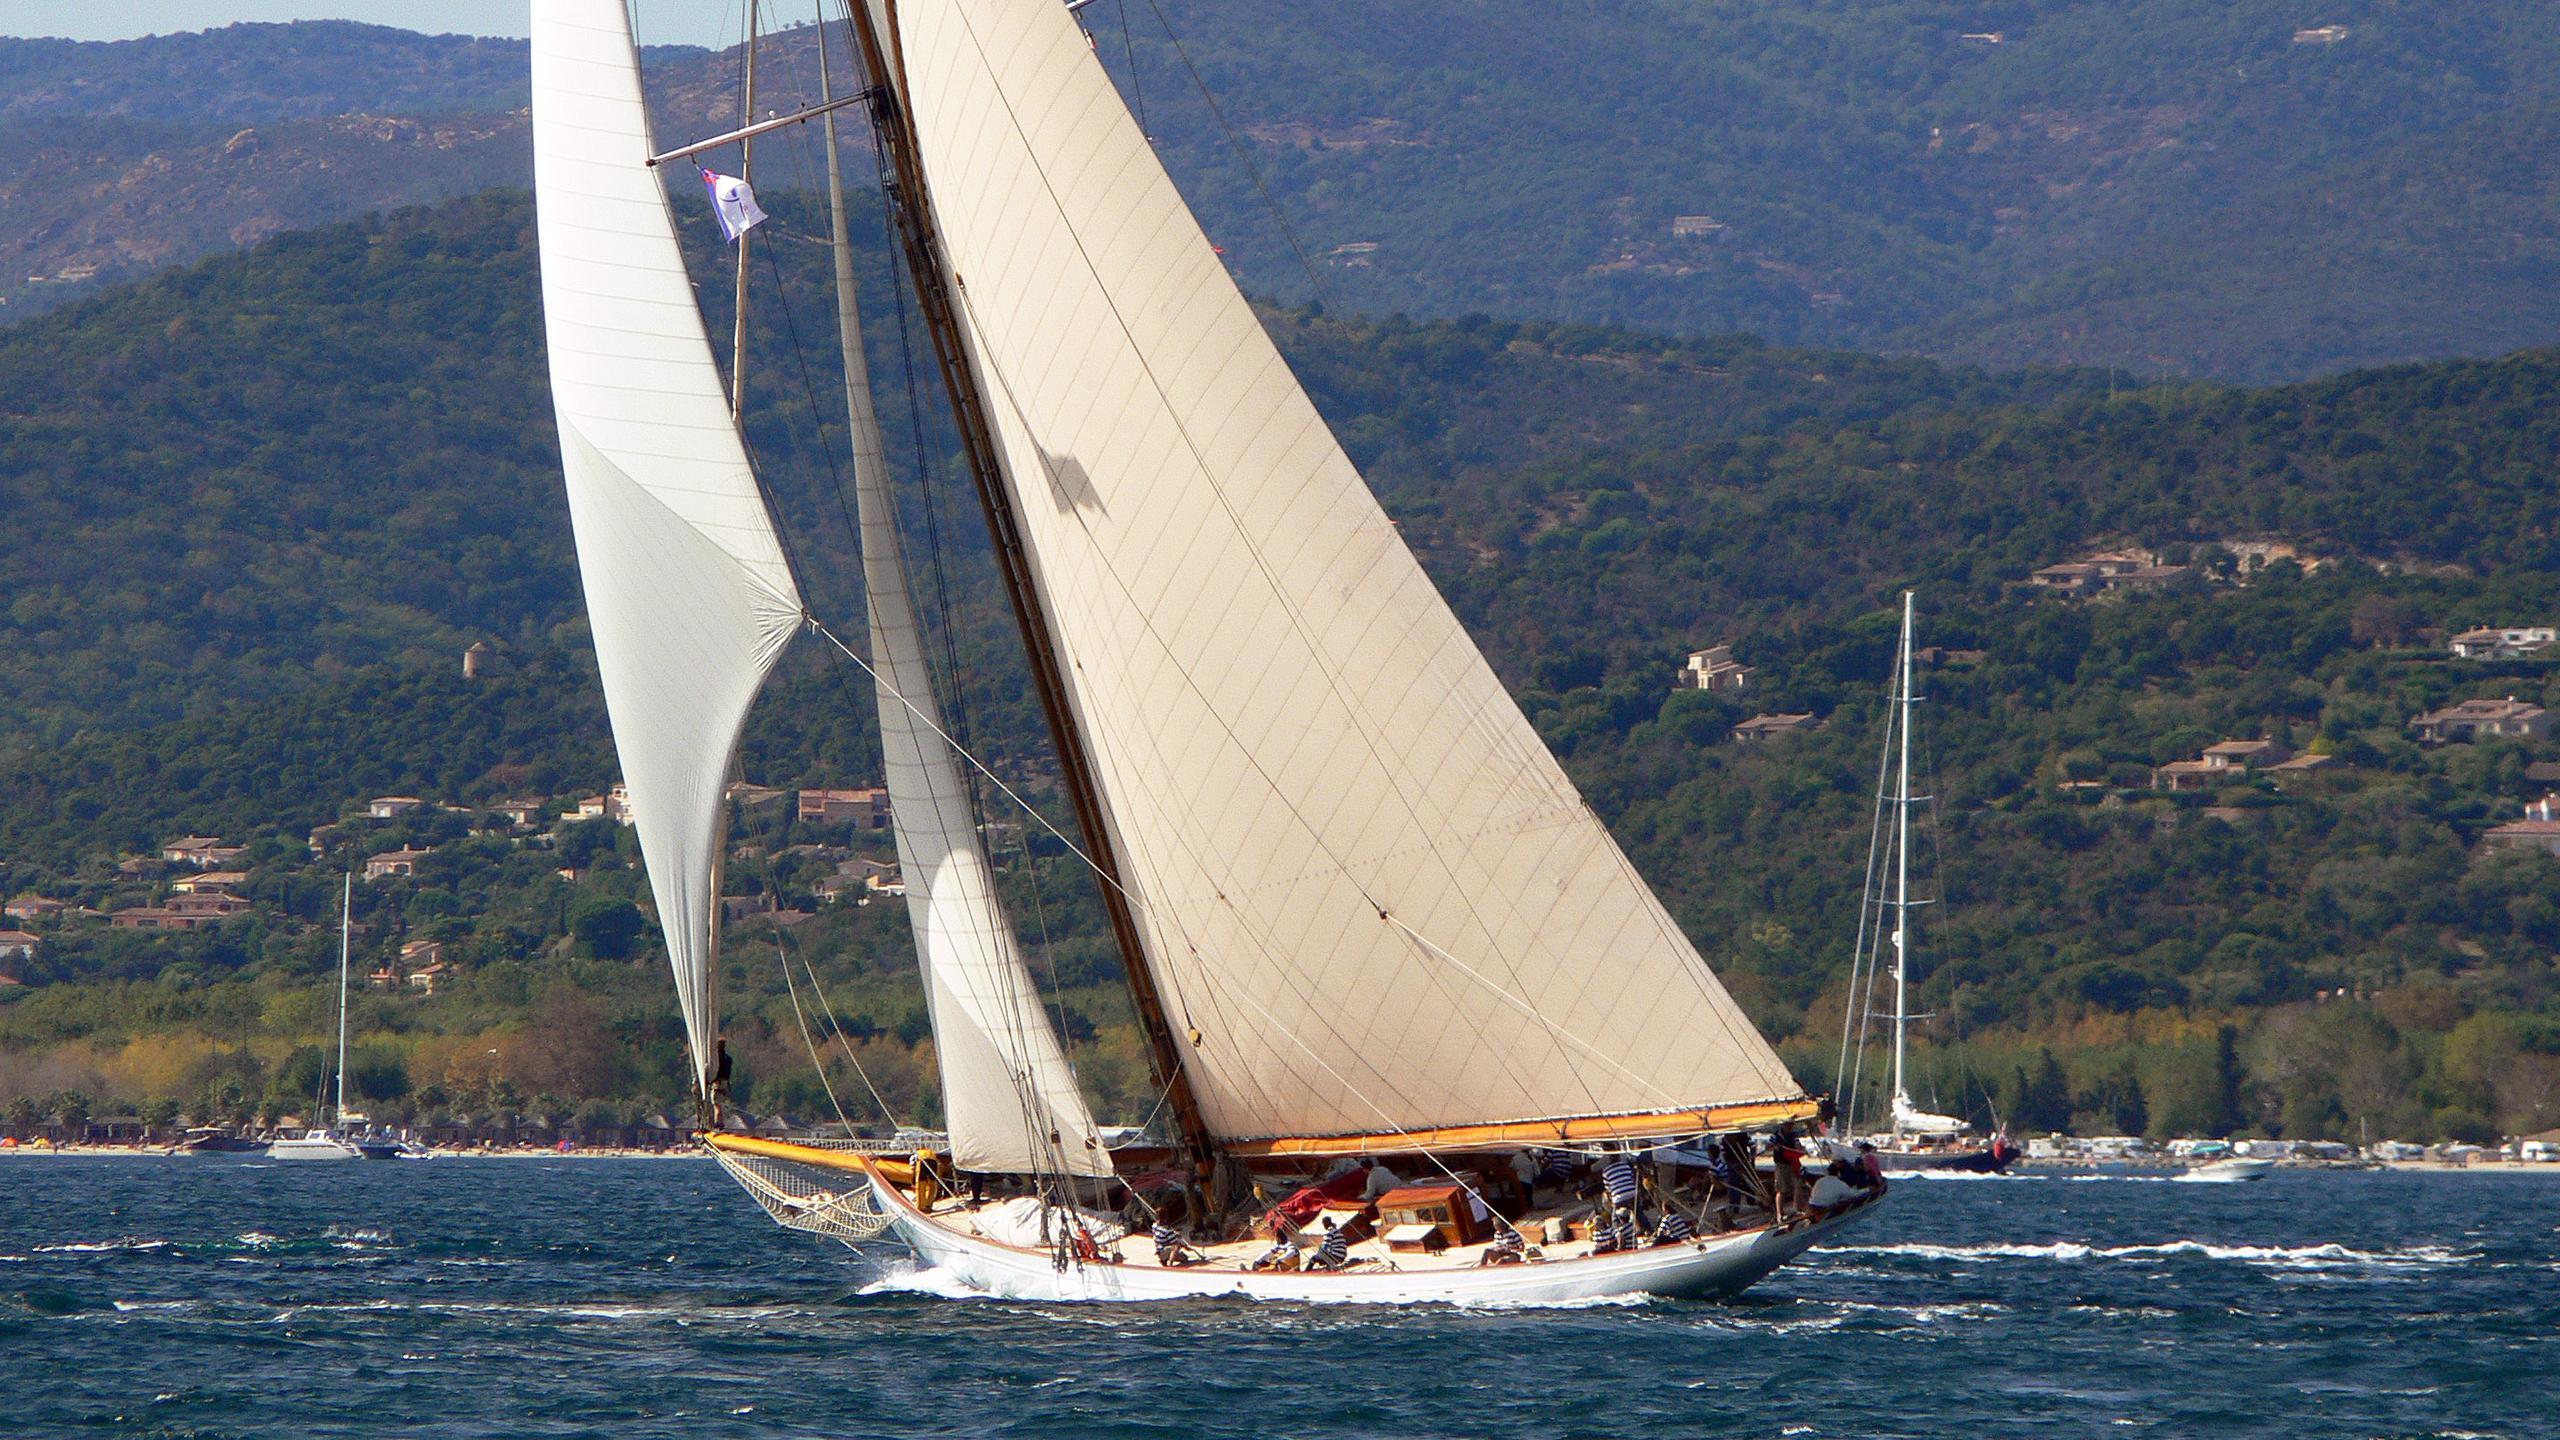 lulworth-sailing-yacht-white-hw-1920-46m-cruising-stern